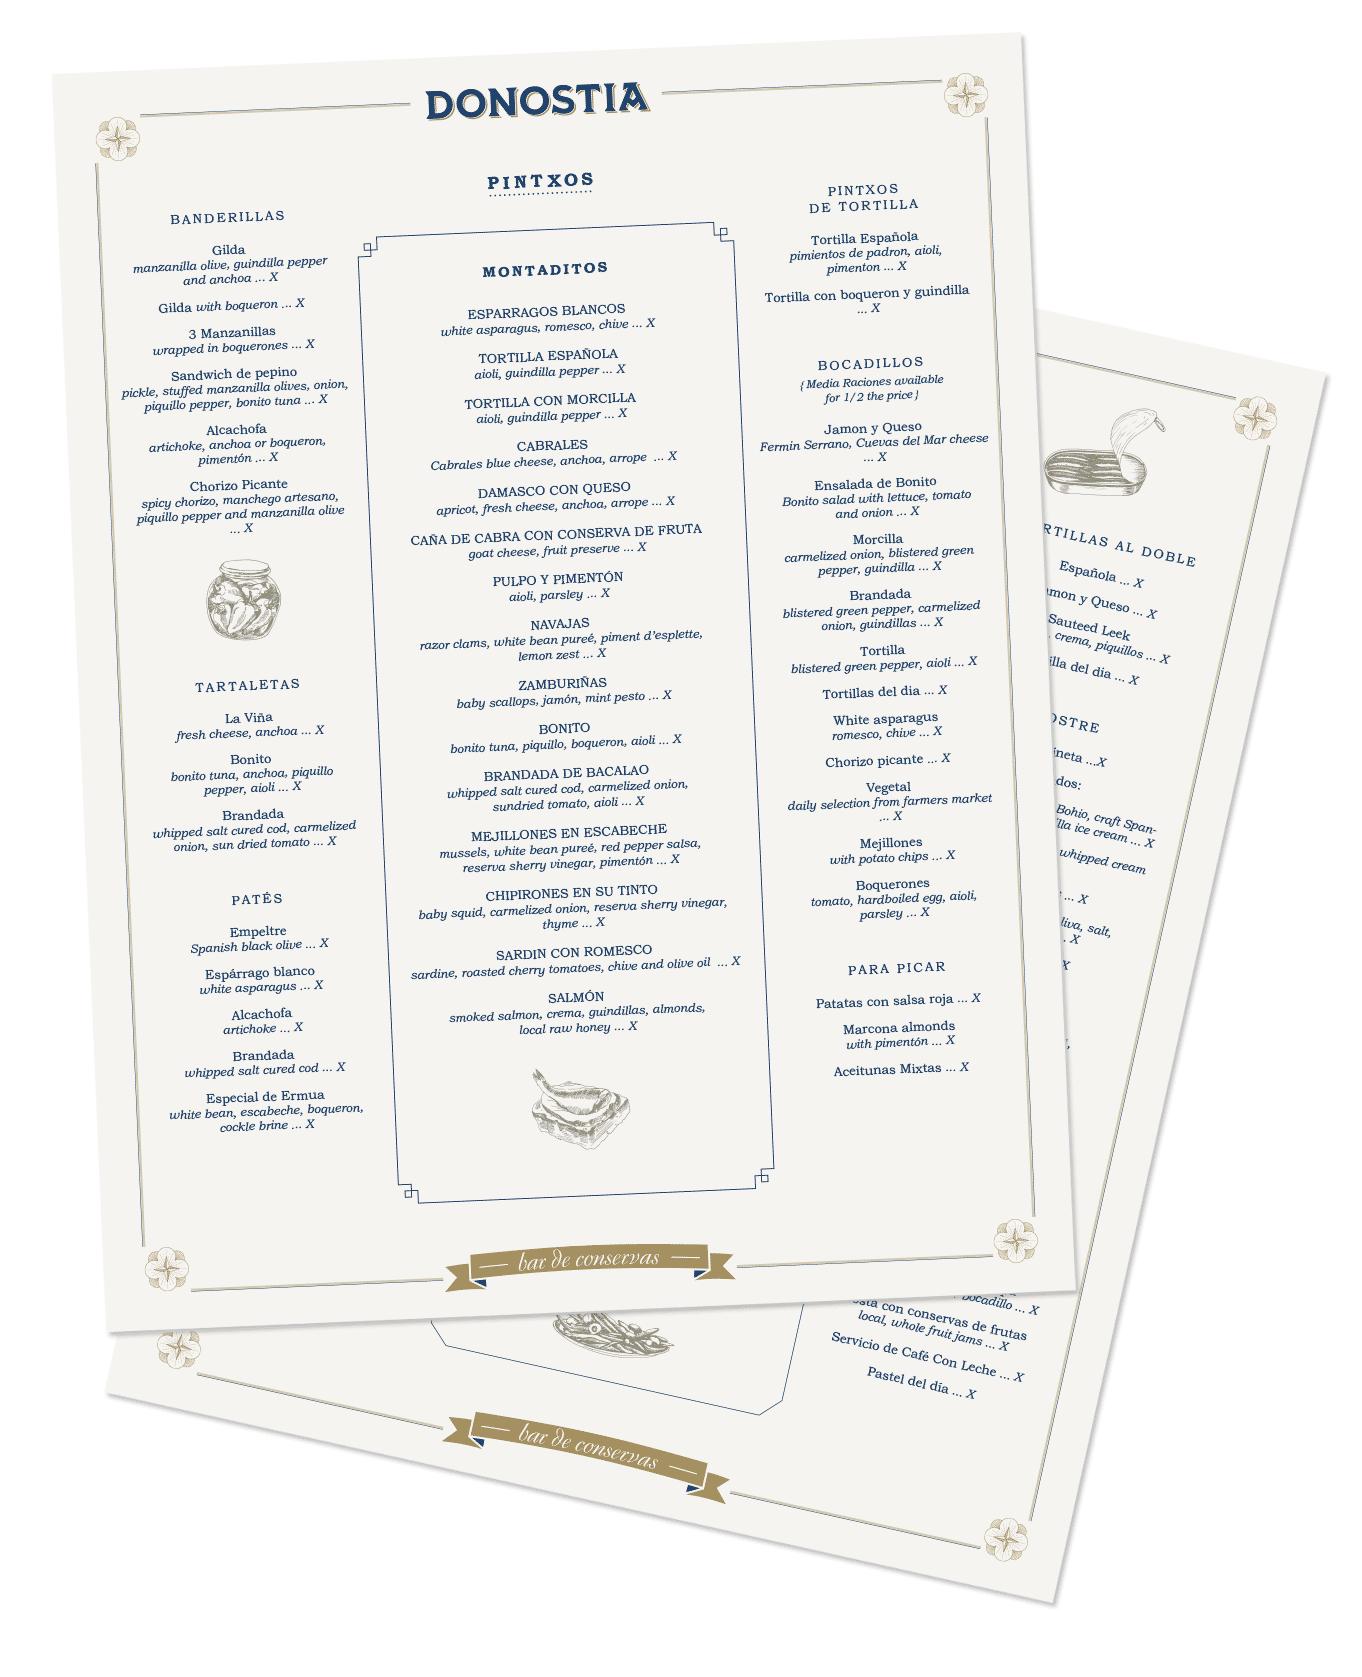 donostia_menu2.png